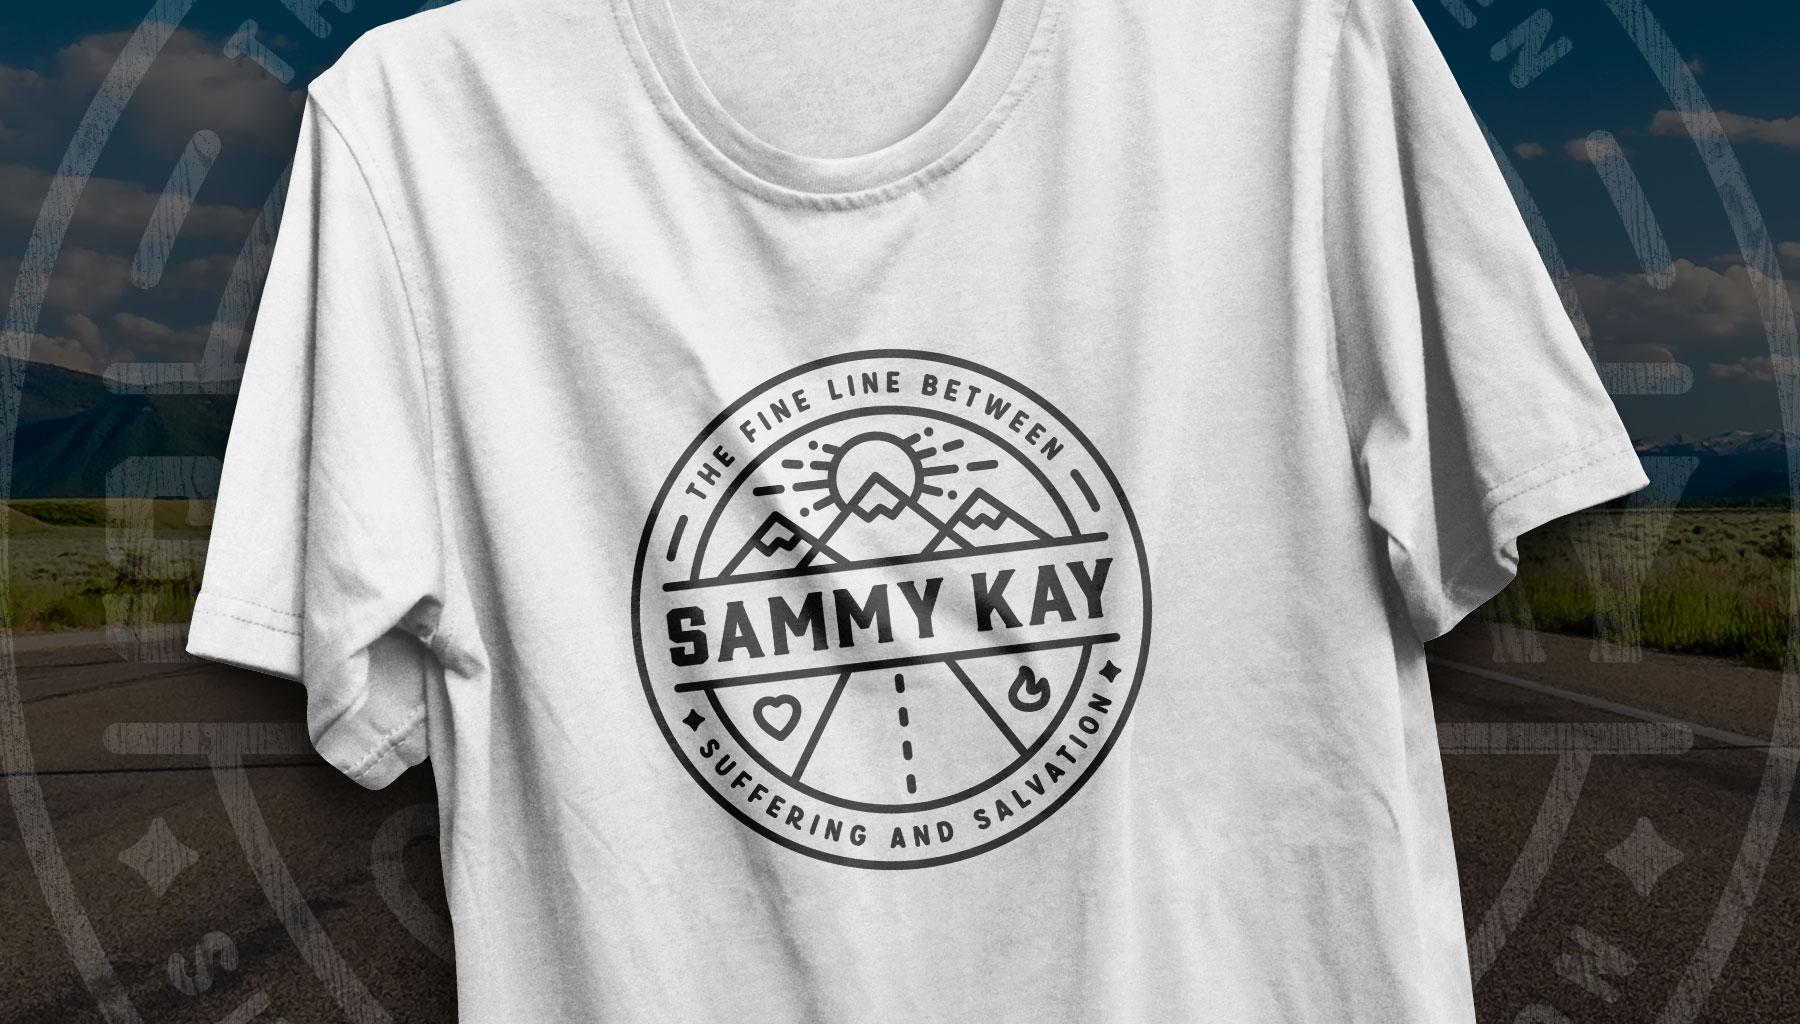 Sammy Kay Suffering and Salvation Shirt